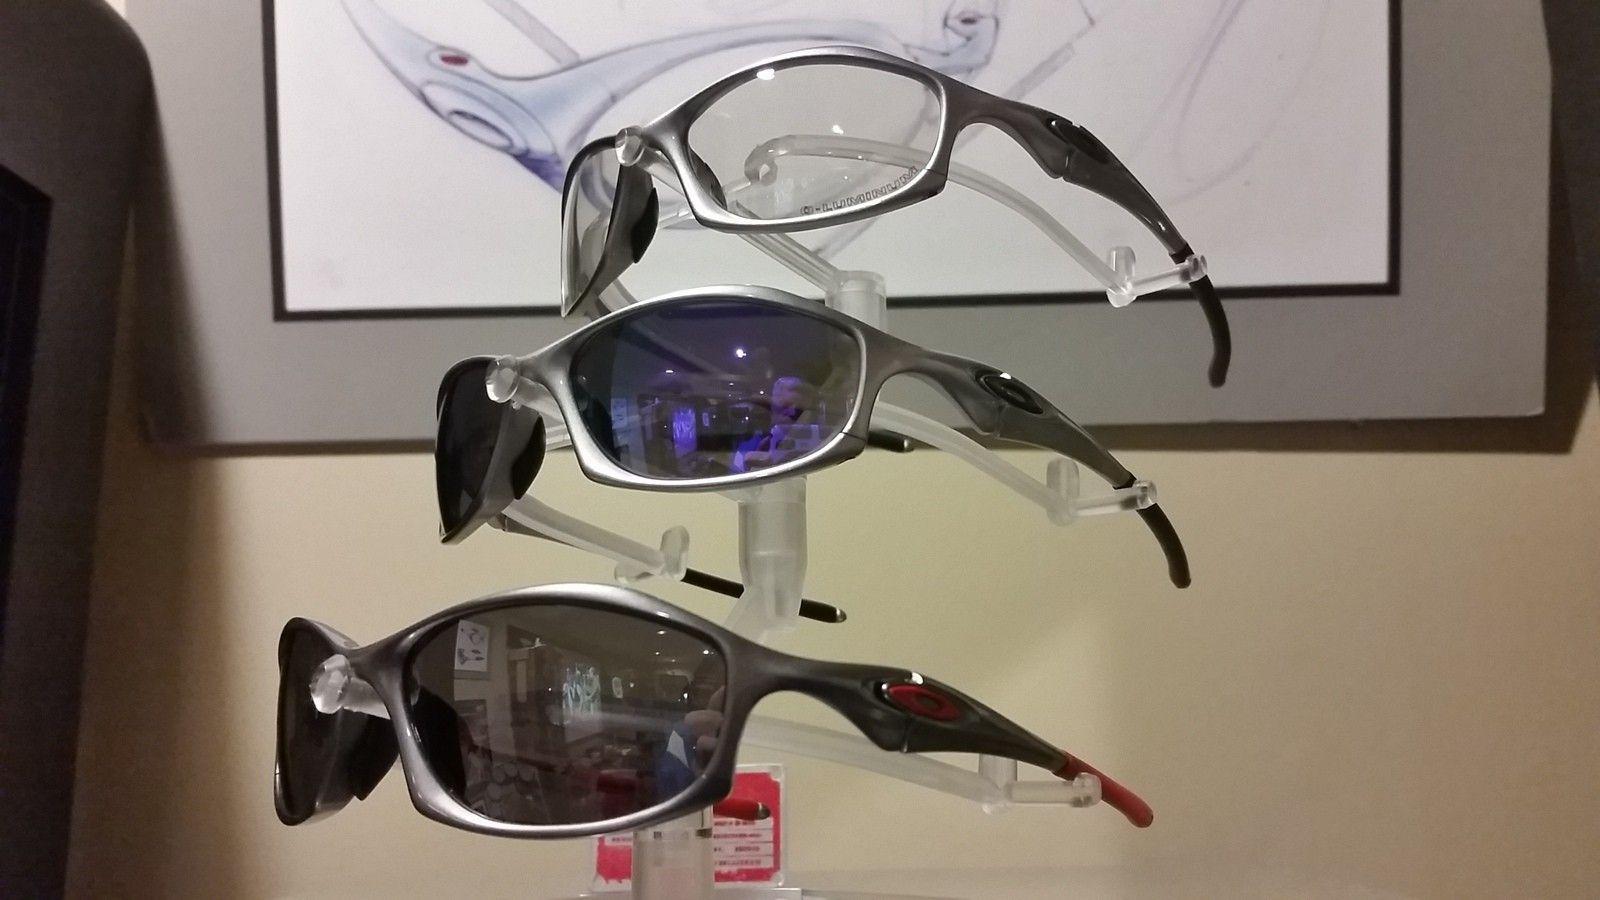 Hatchet and Eye Jacket 2.0 lens choices - 20151224_191258.jpg